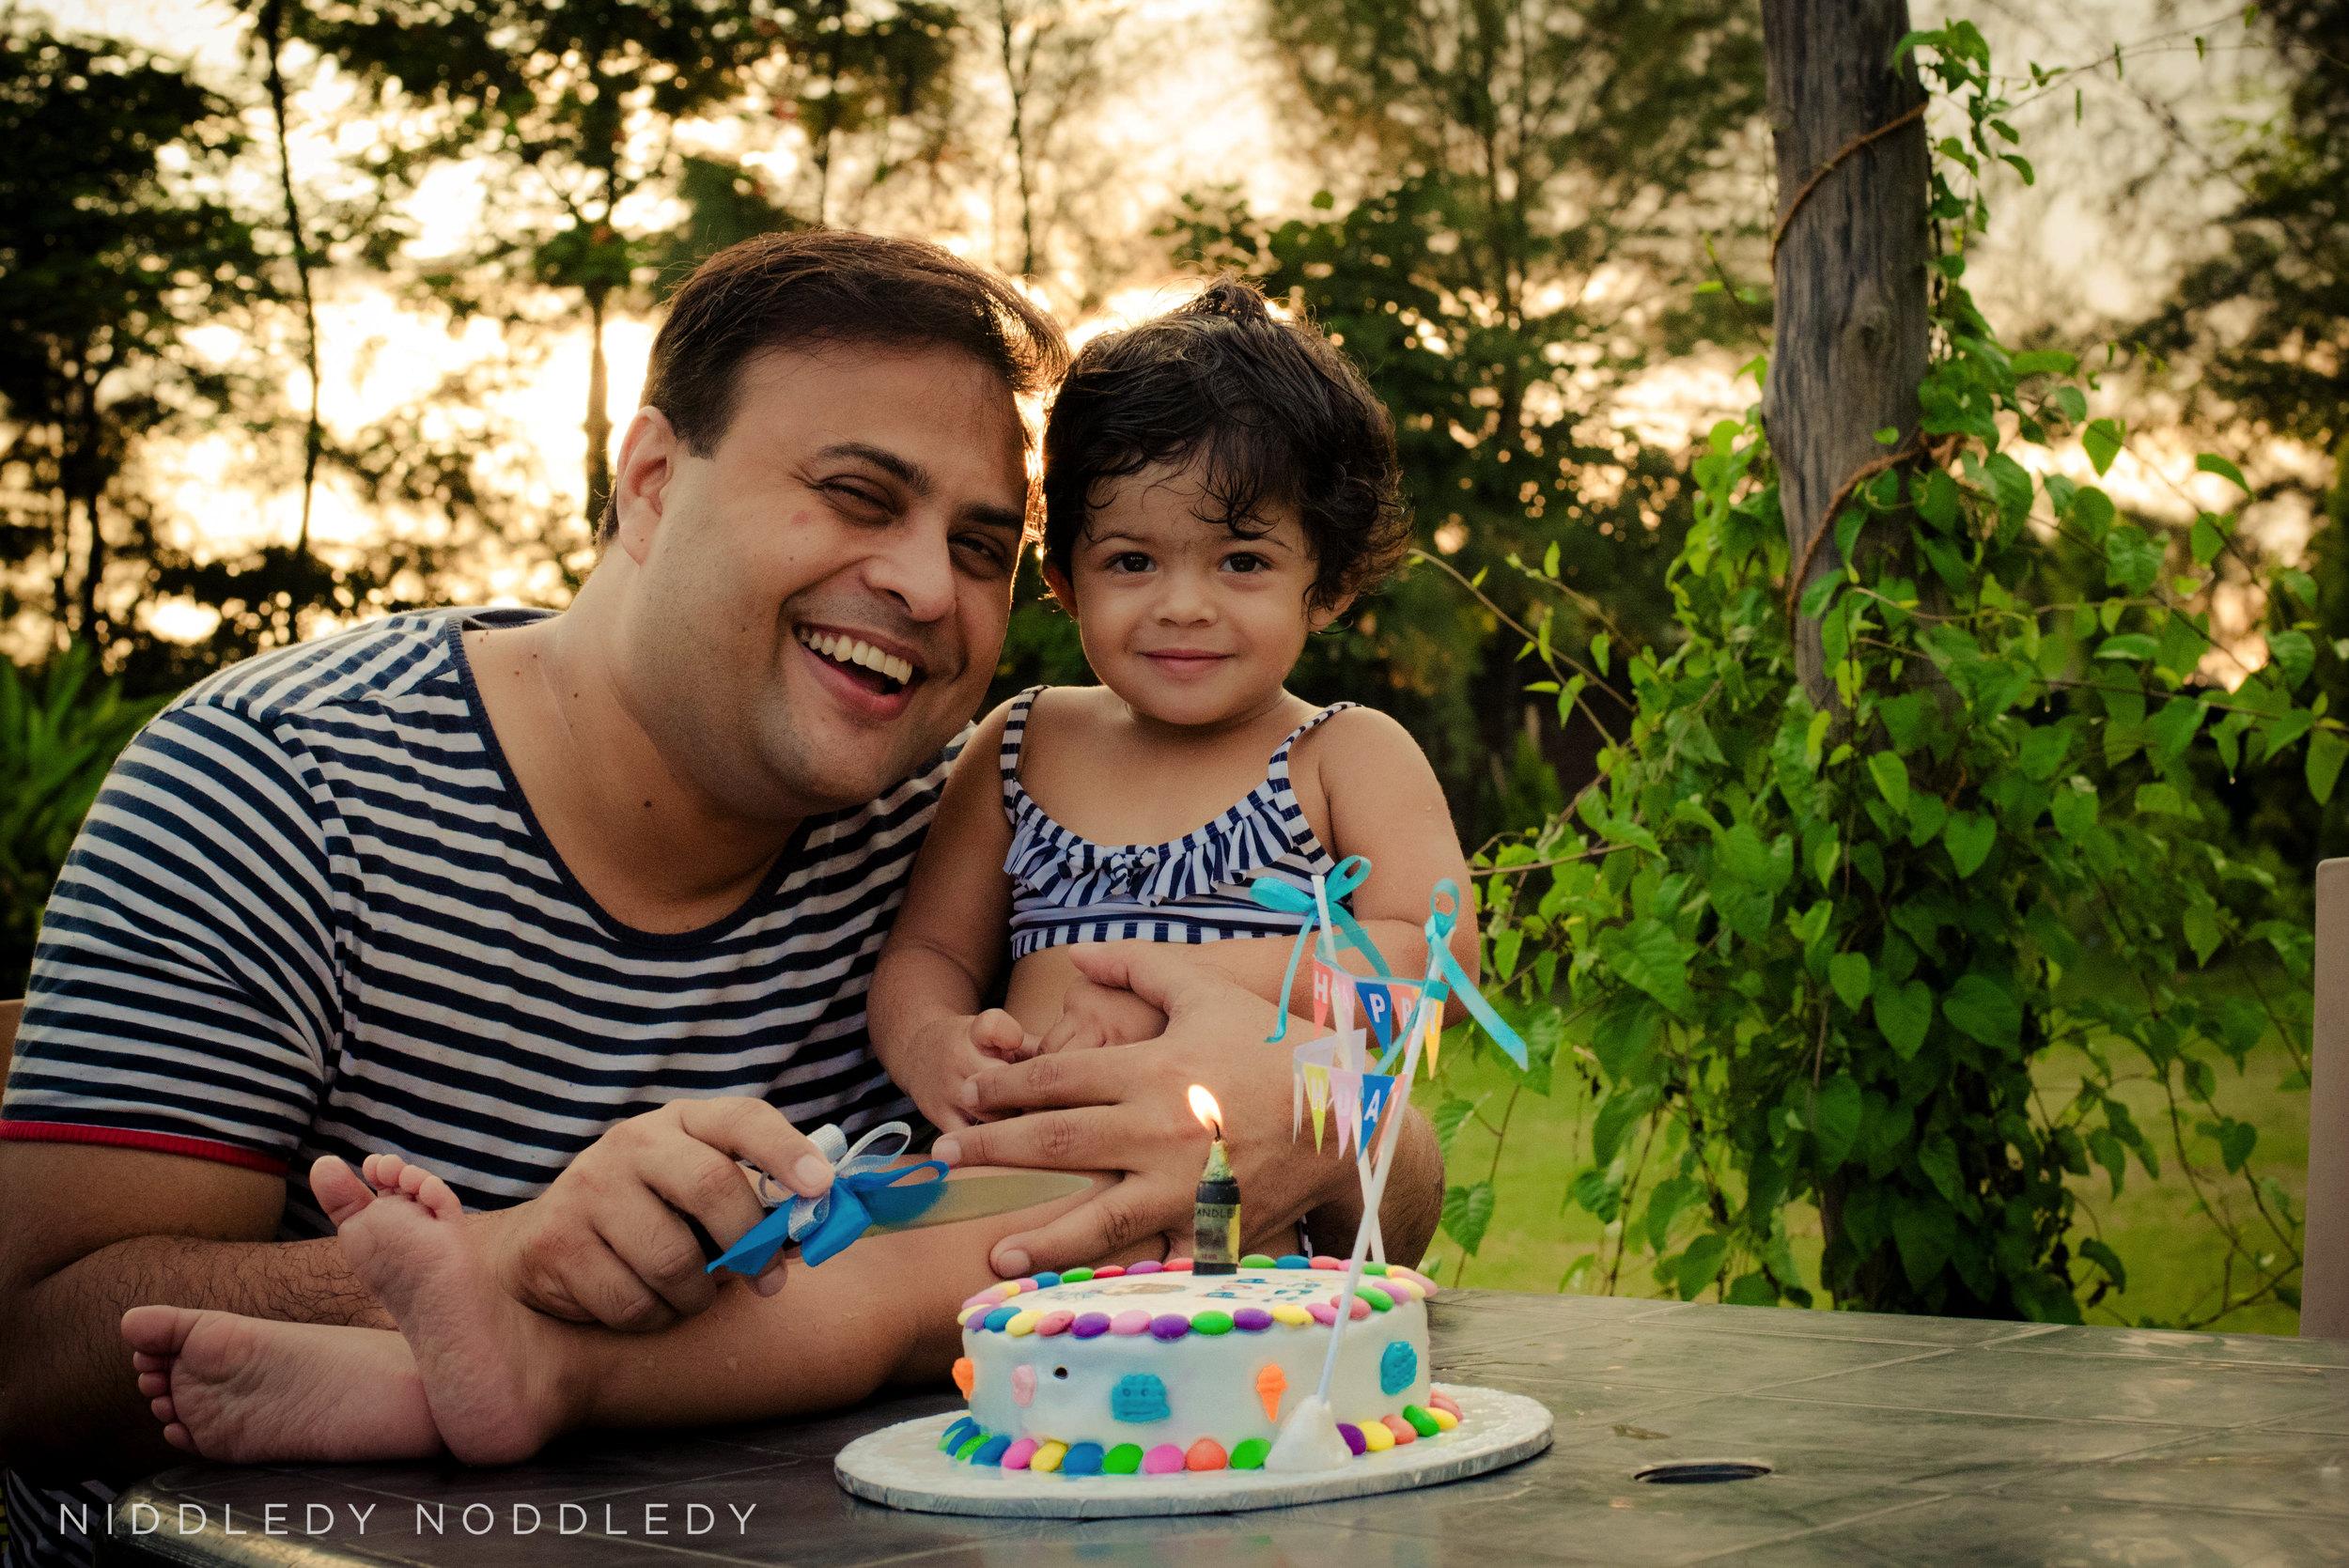 Best Photographer ❤ NiddledyNoddledy.com ~ Prenatal, Newborn and Child Photography, Calcutta - 04.jpg